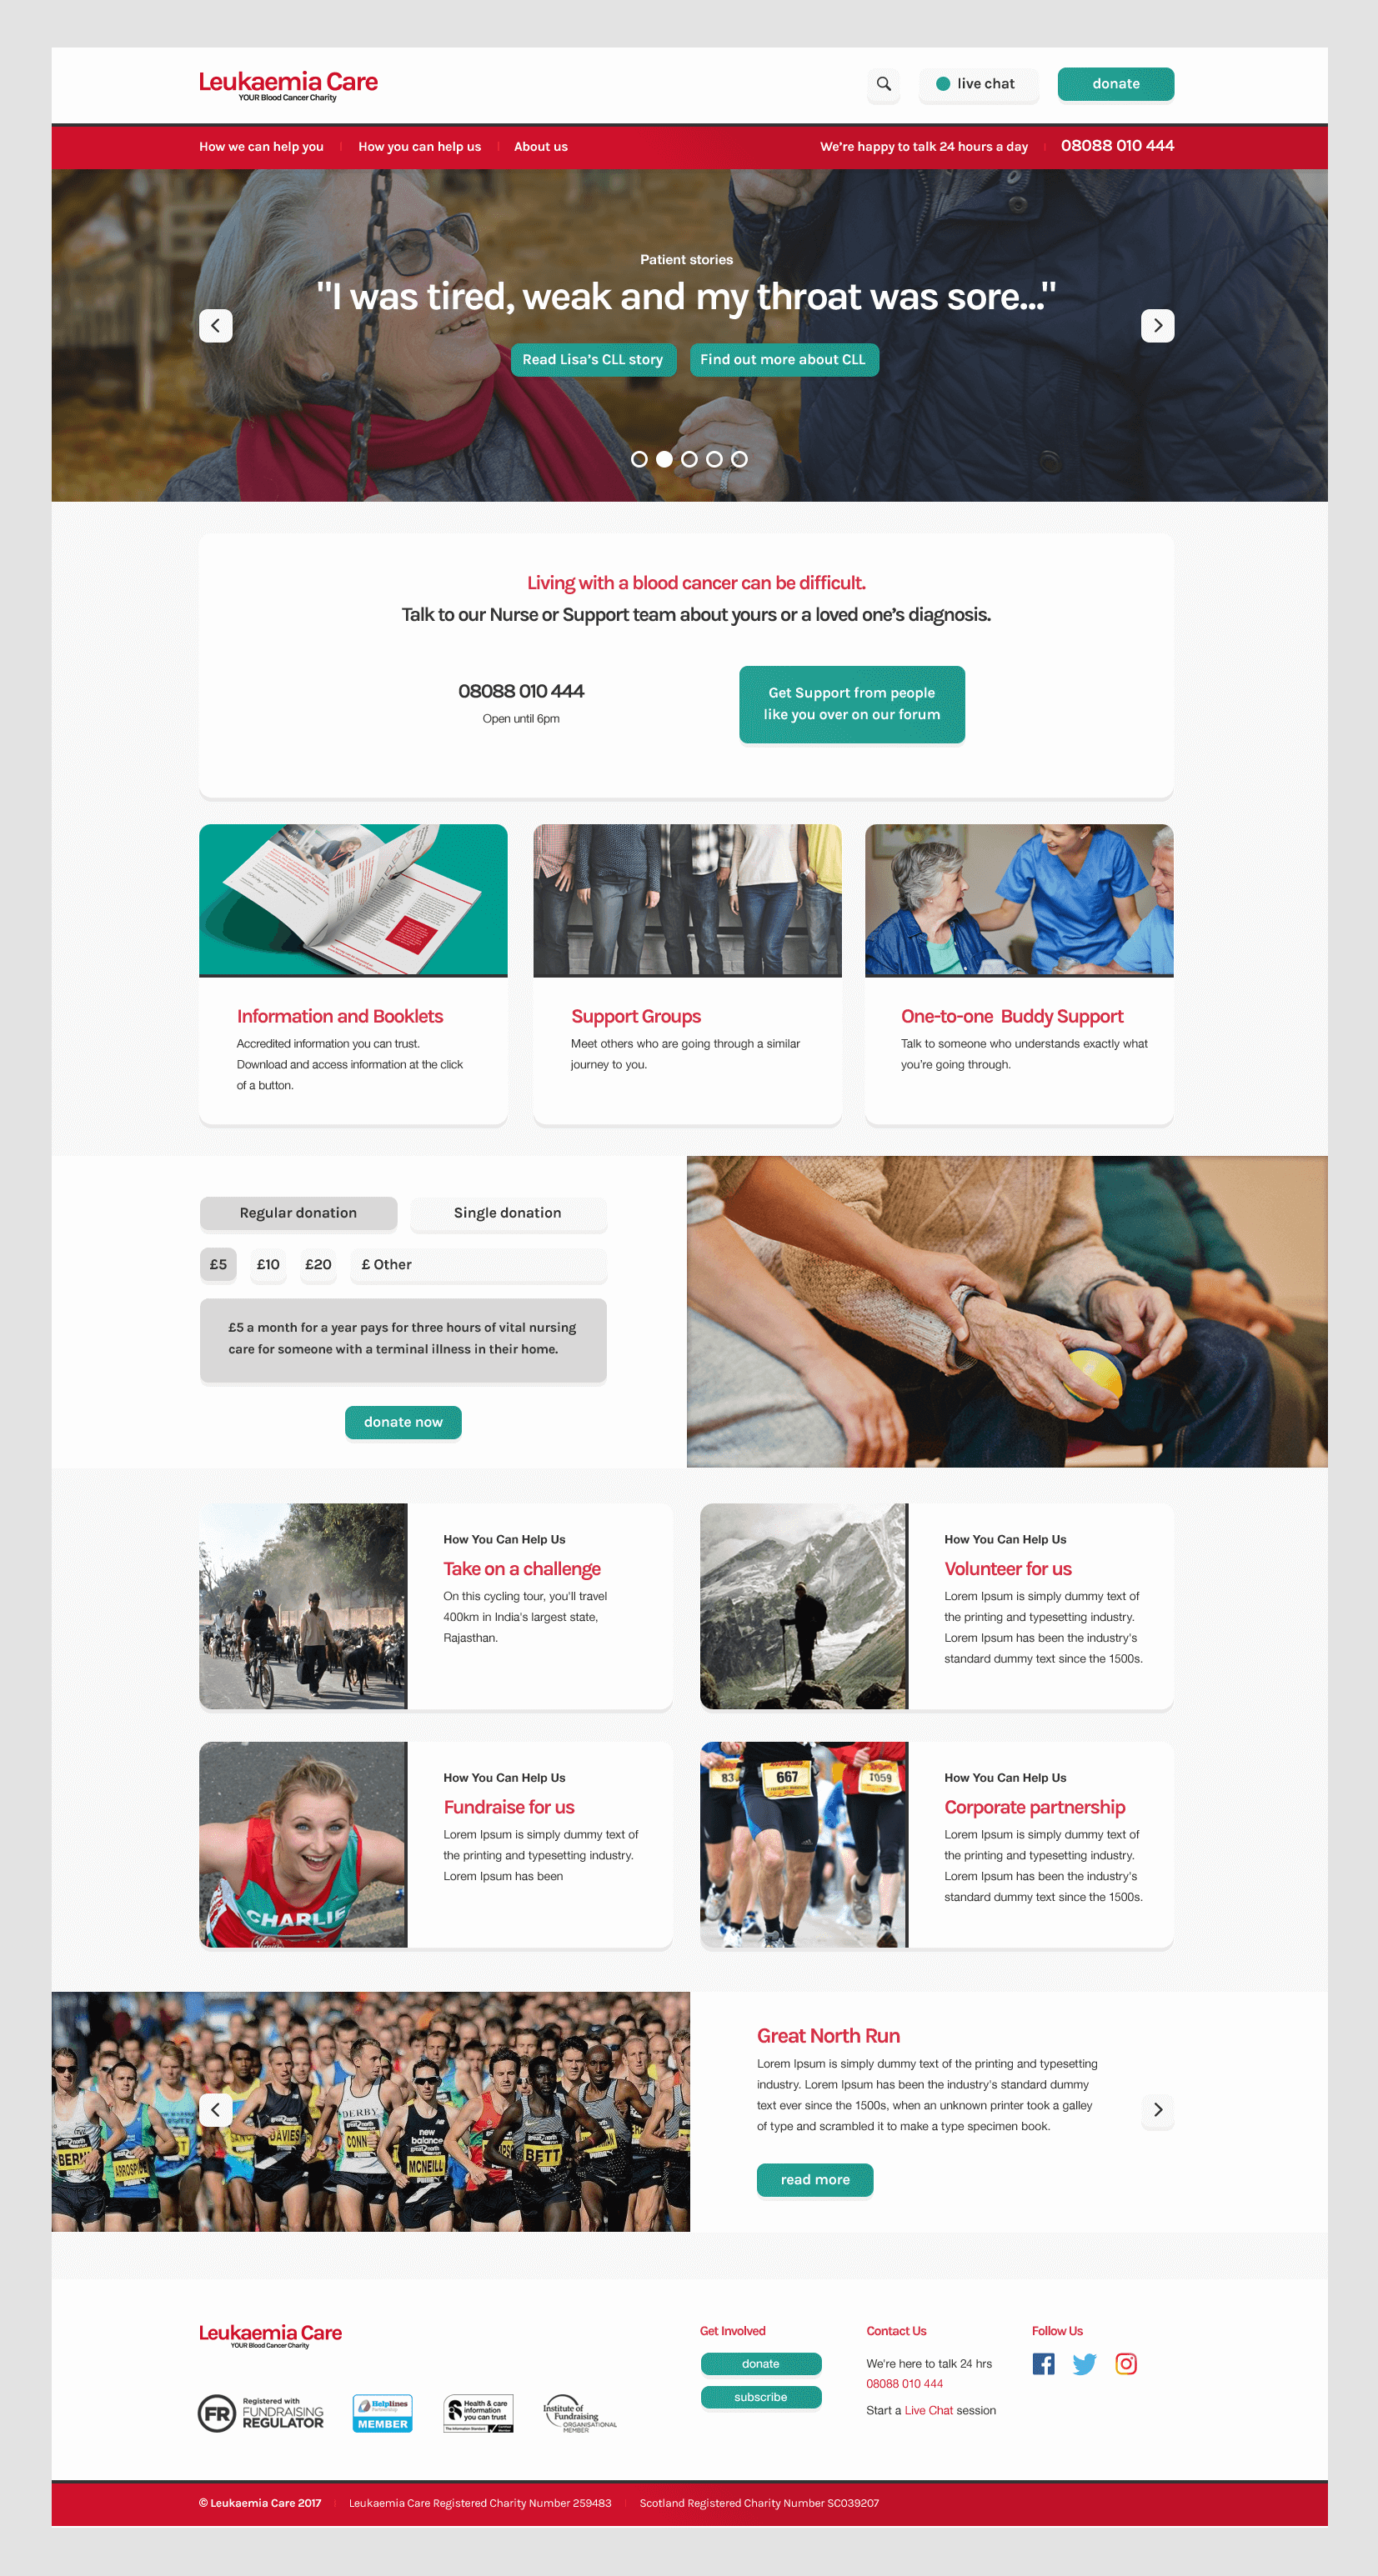 Leukaemia Care Home Page Design